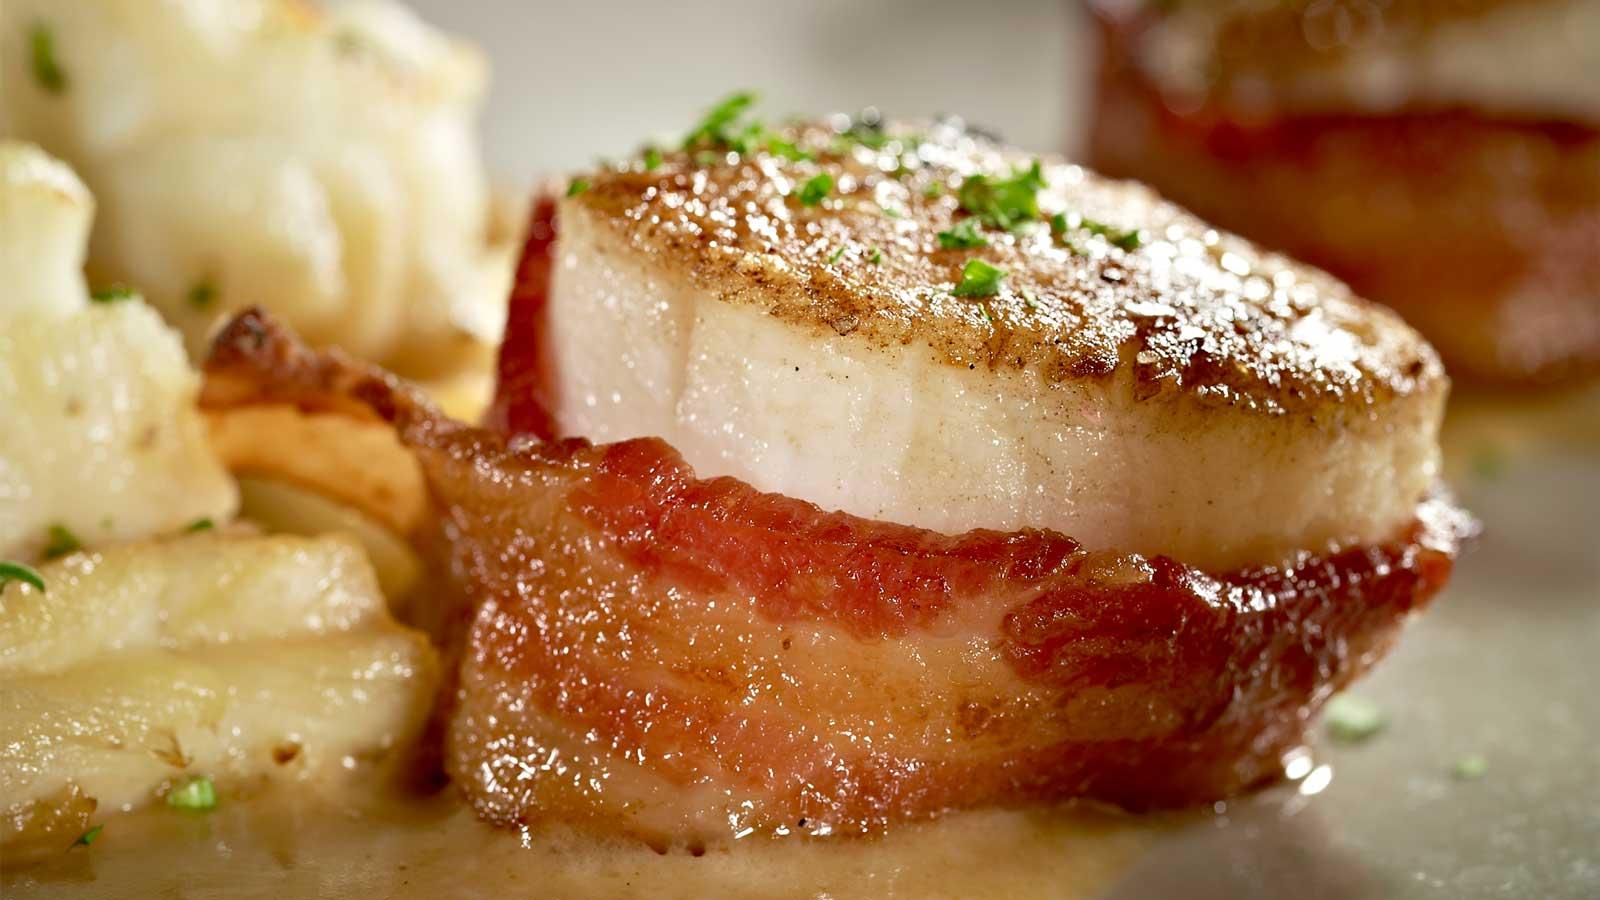 Mo's-scallop-with-bacon-scallops.jpg